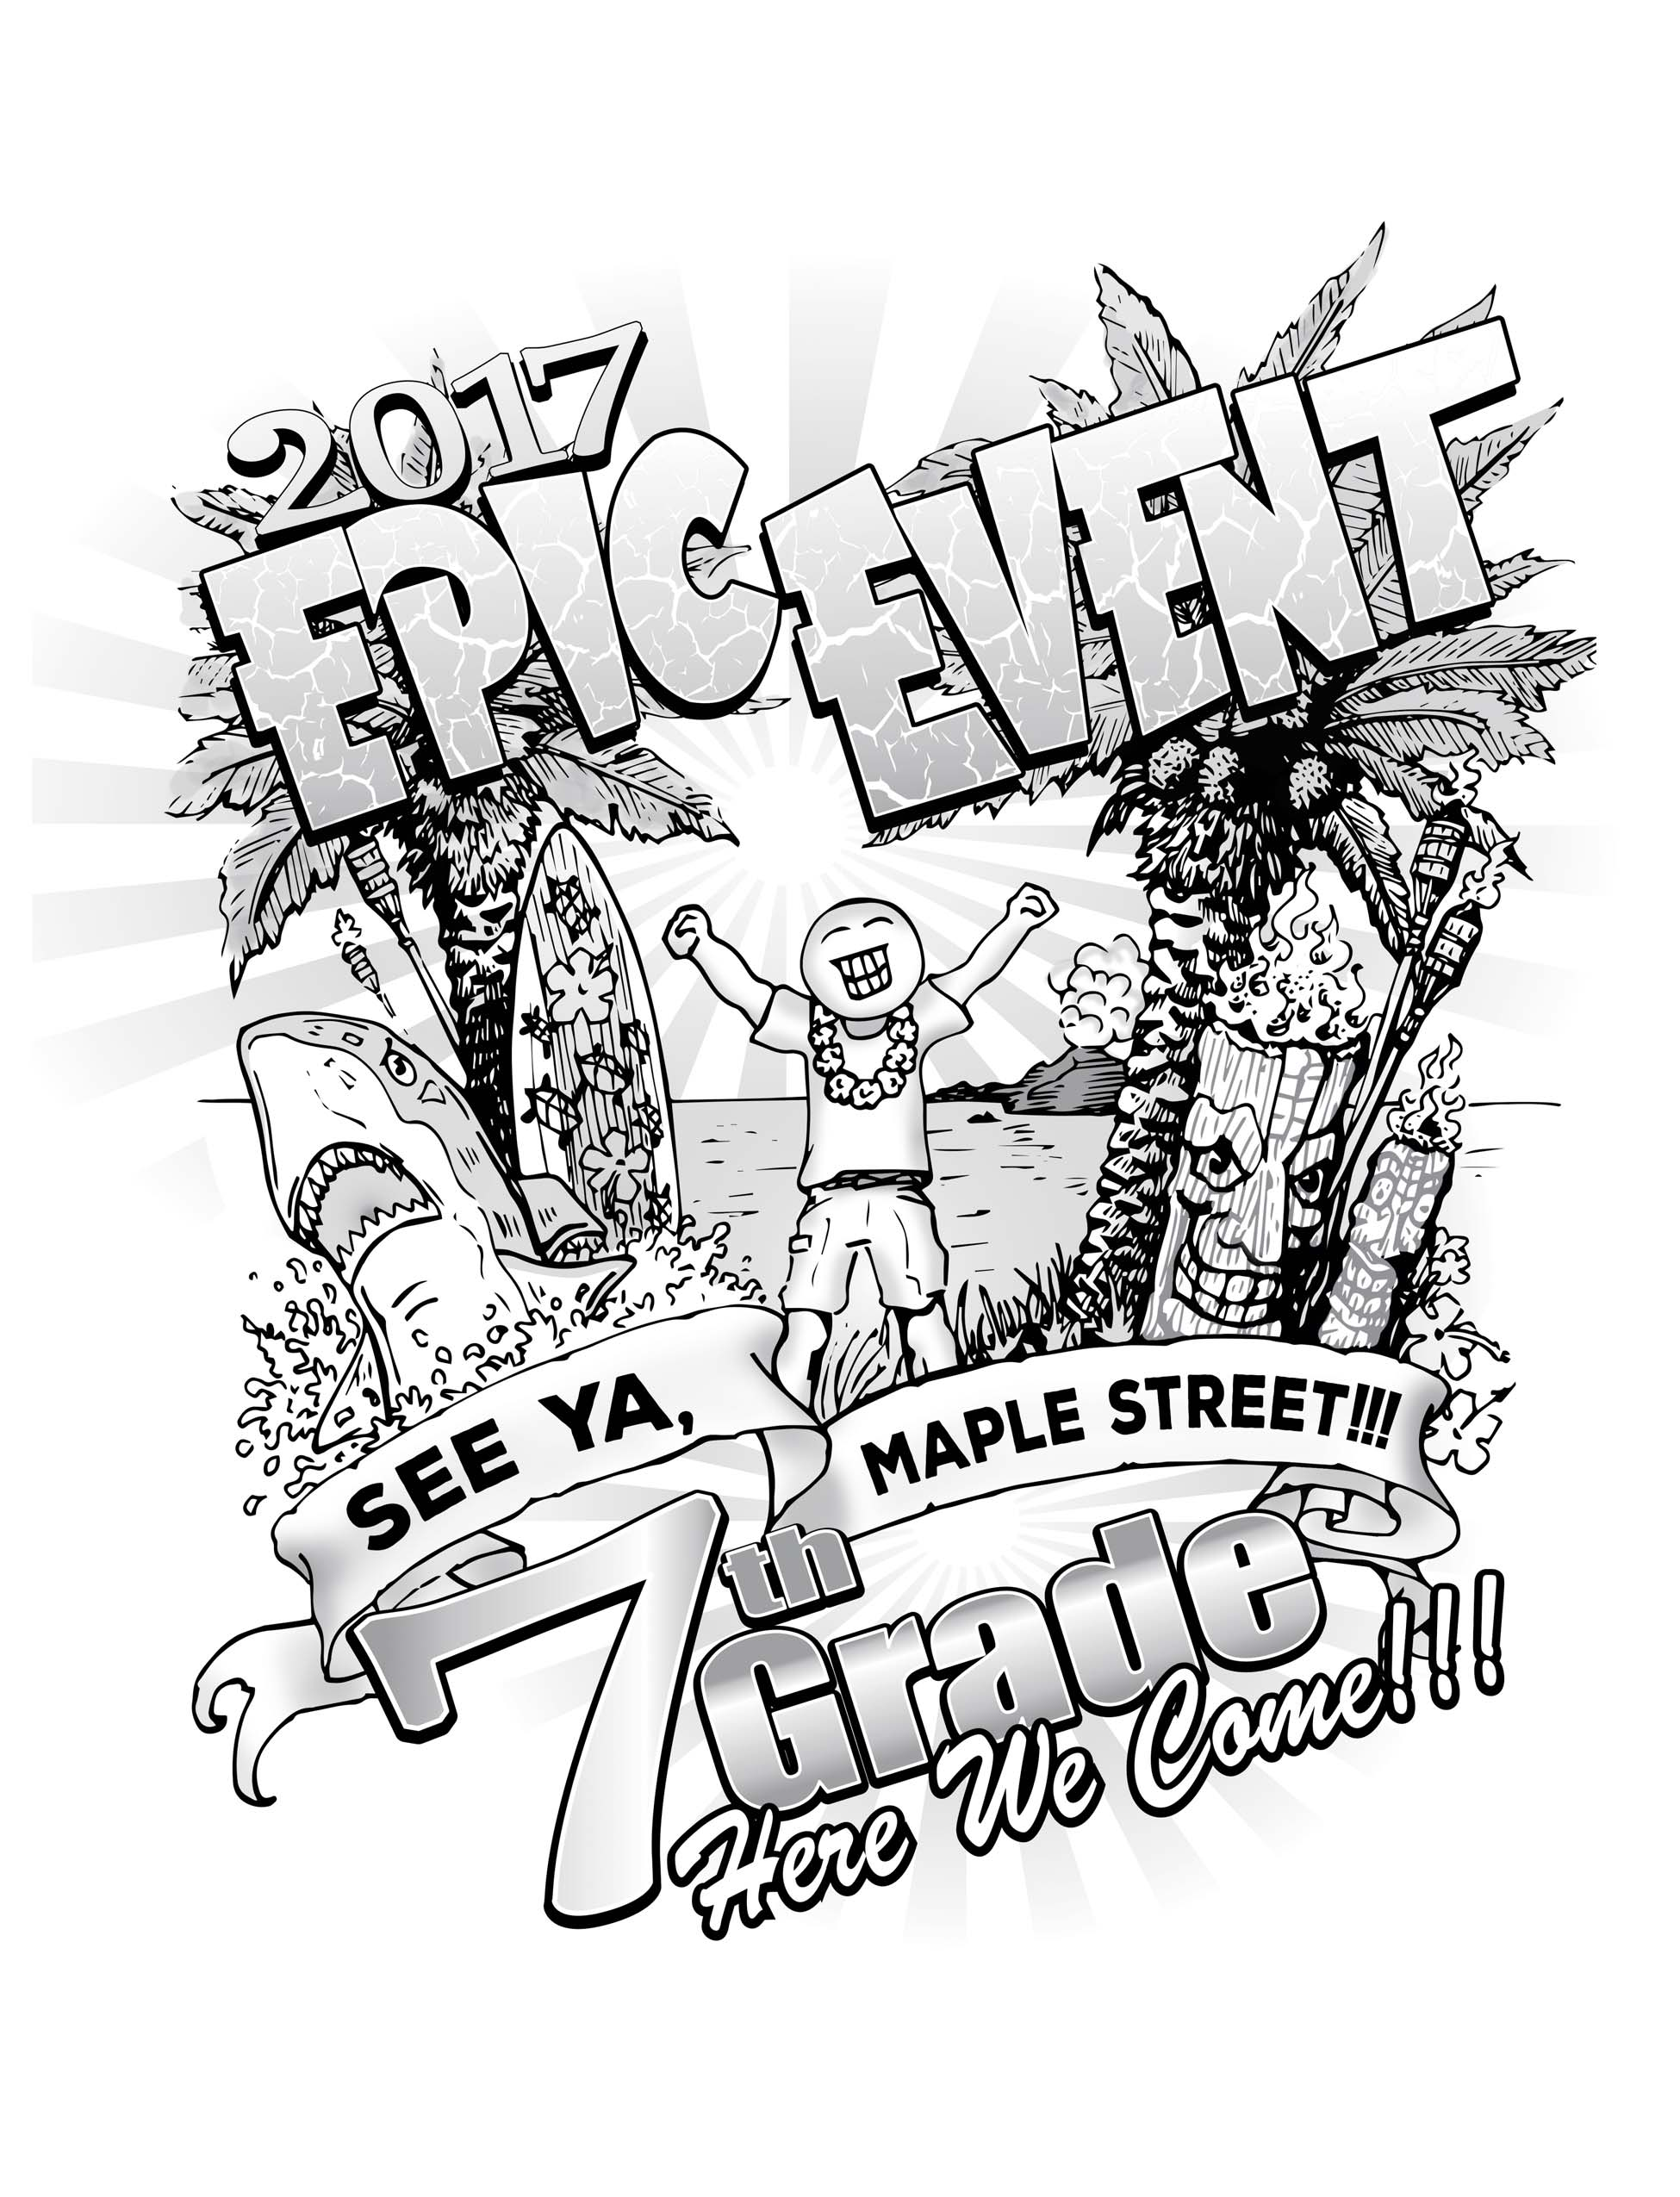 EPIC EVENT 1st draft 5 31 2017 PROOF.jpg